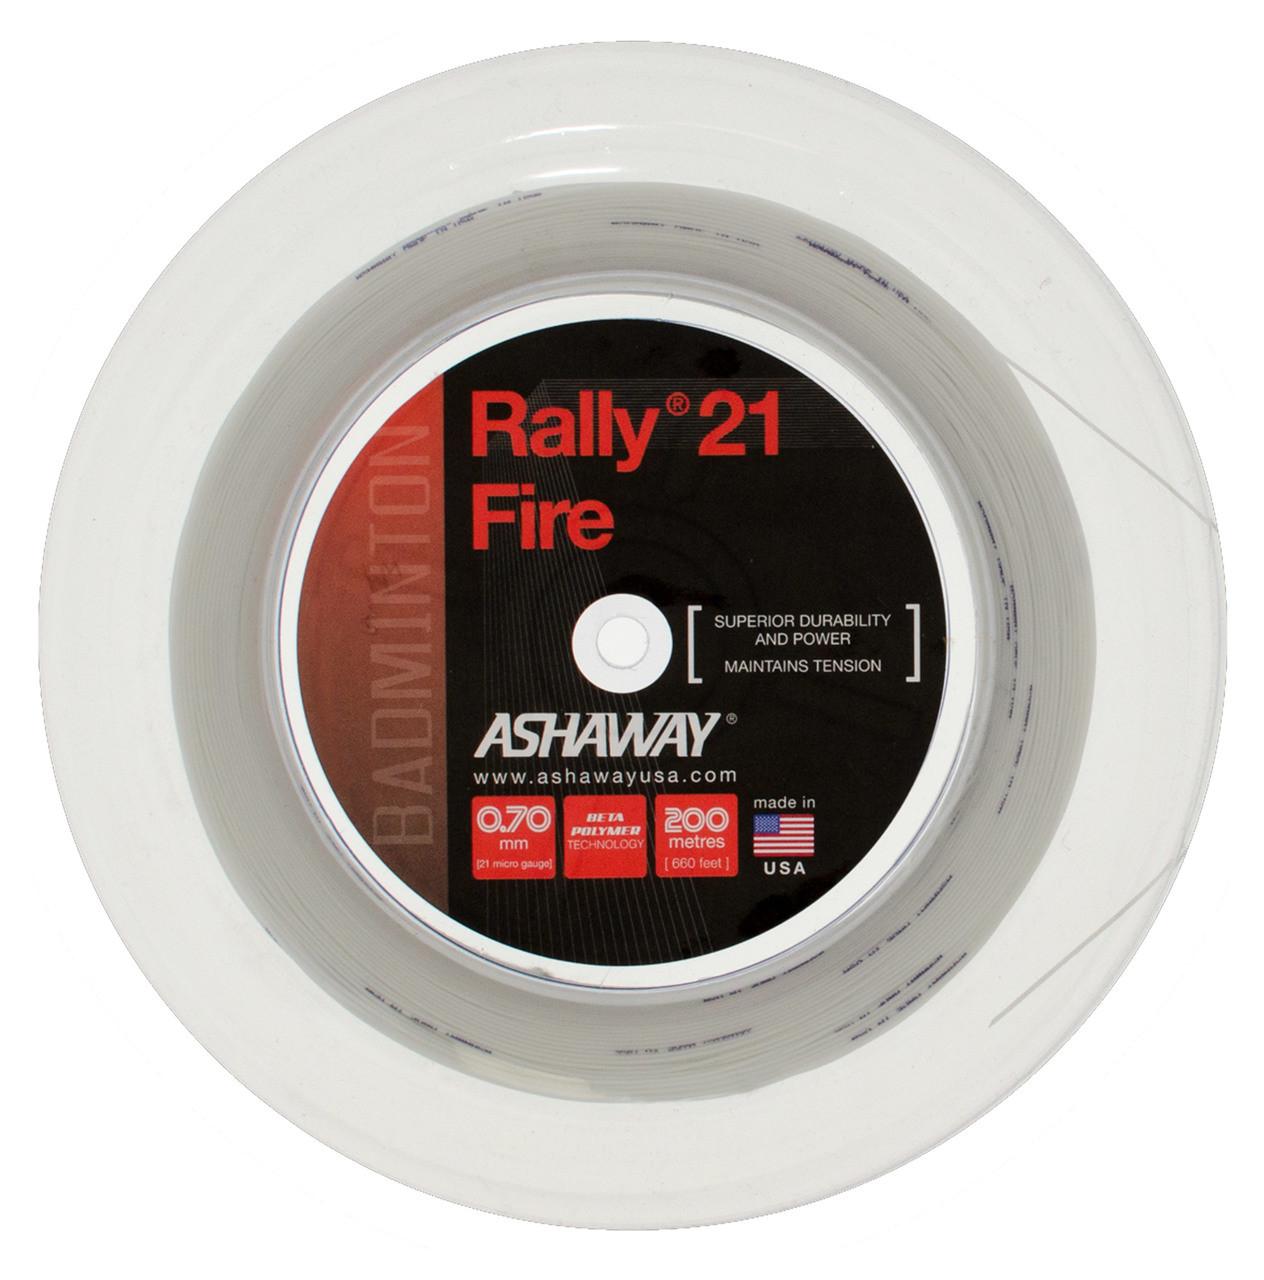 White Ashaway Rally 21/Fire badminton string set